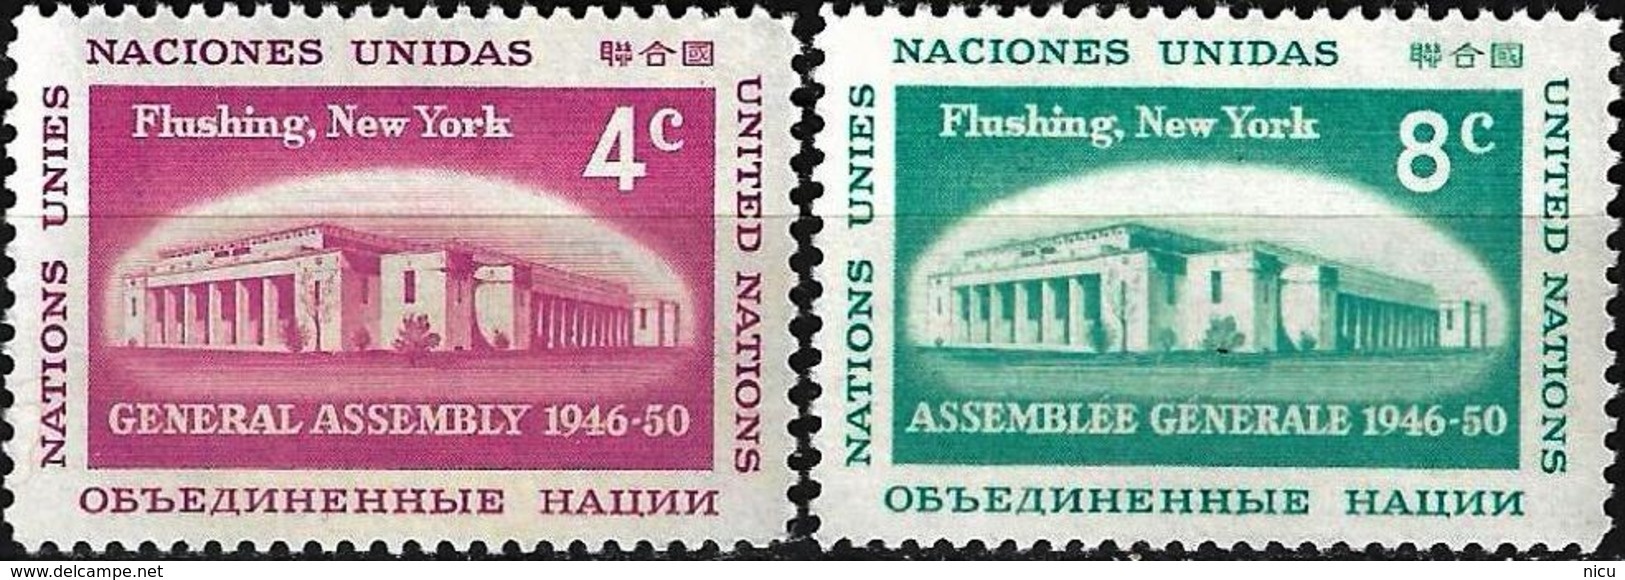 1959 - FLUSHING NEW YORK - Michel Nr. 76-77 = 0.50 € - New York -  VN Hauptquartier